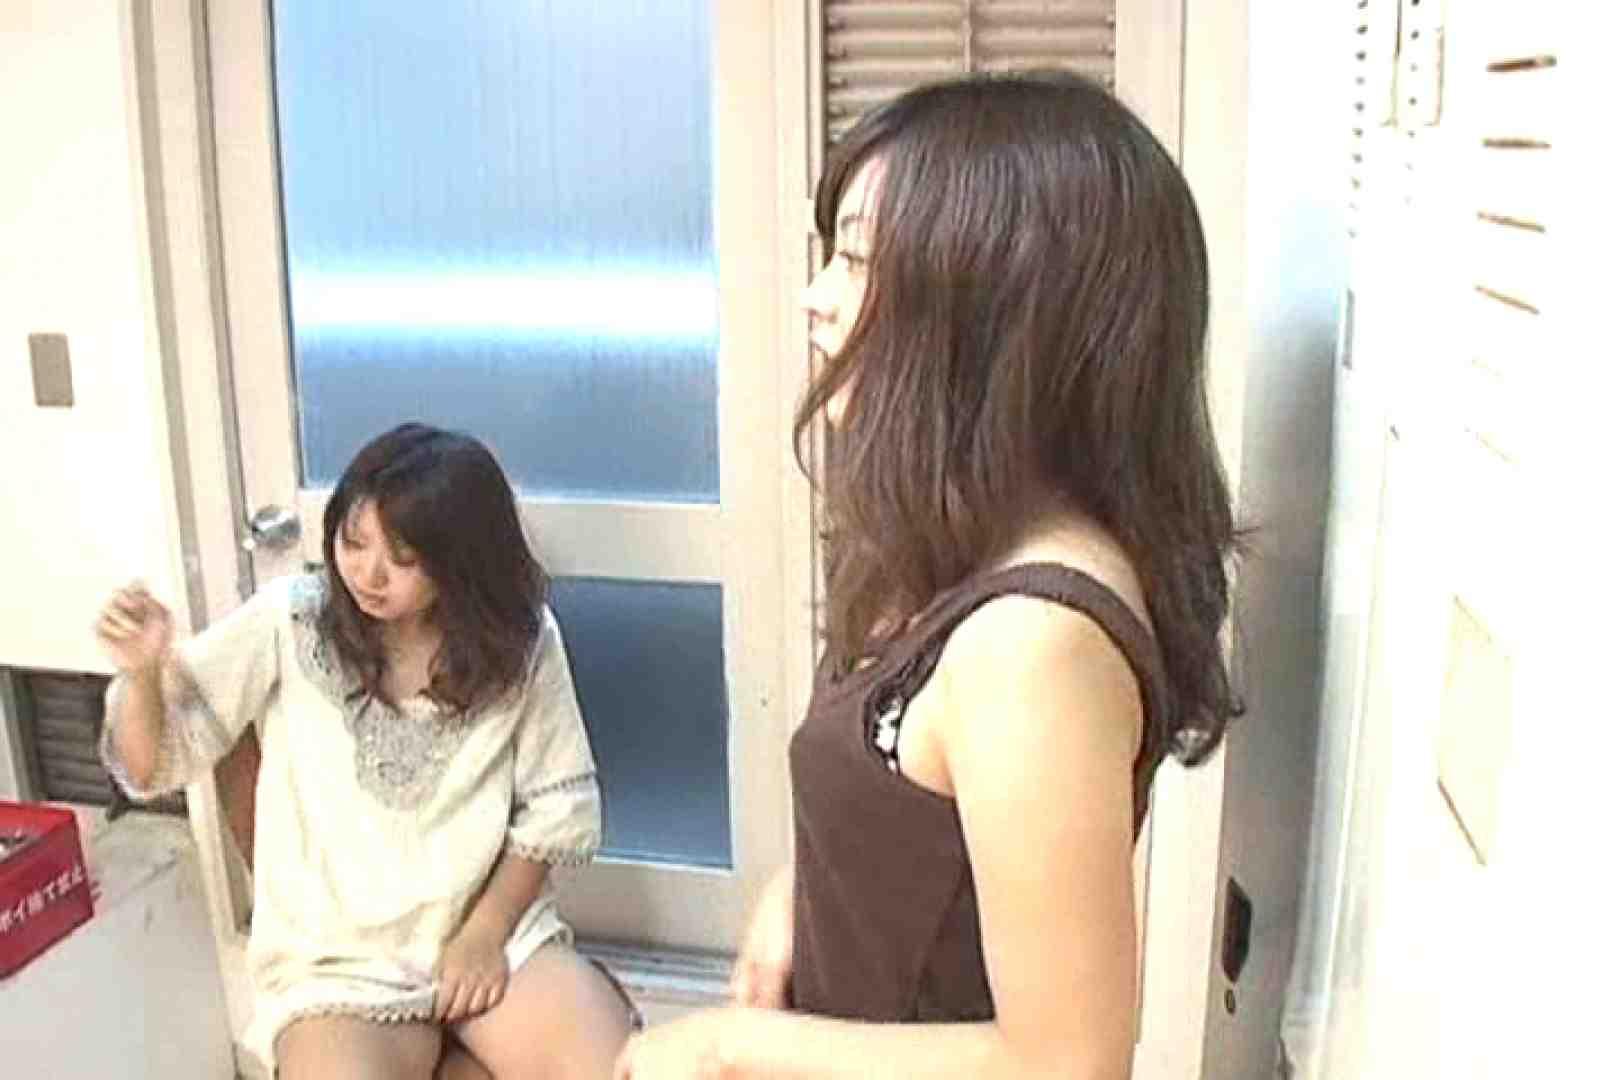 キャバ嬢舞台裏Vol.3 盗撮特集 オメコ無修正動画無料 100画像 2